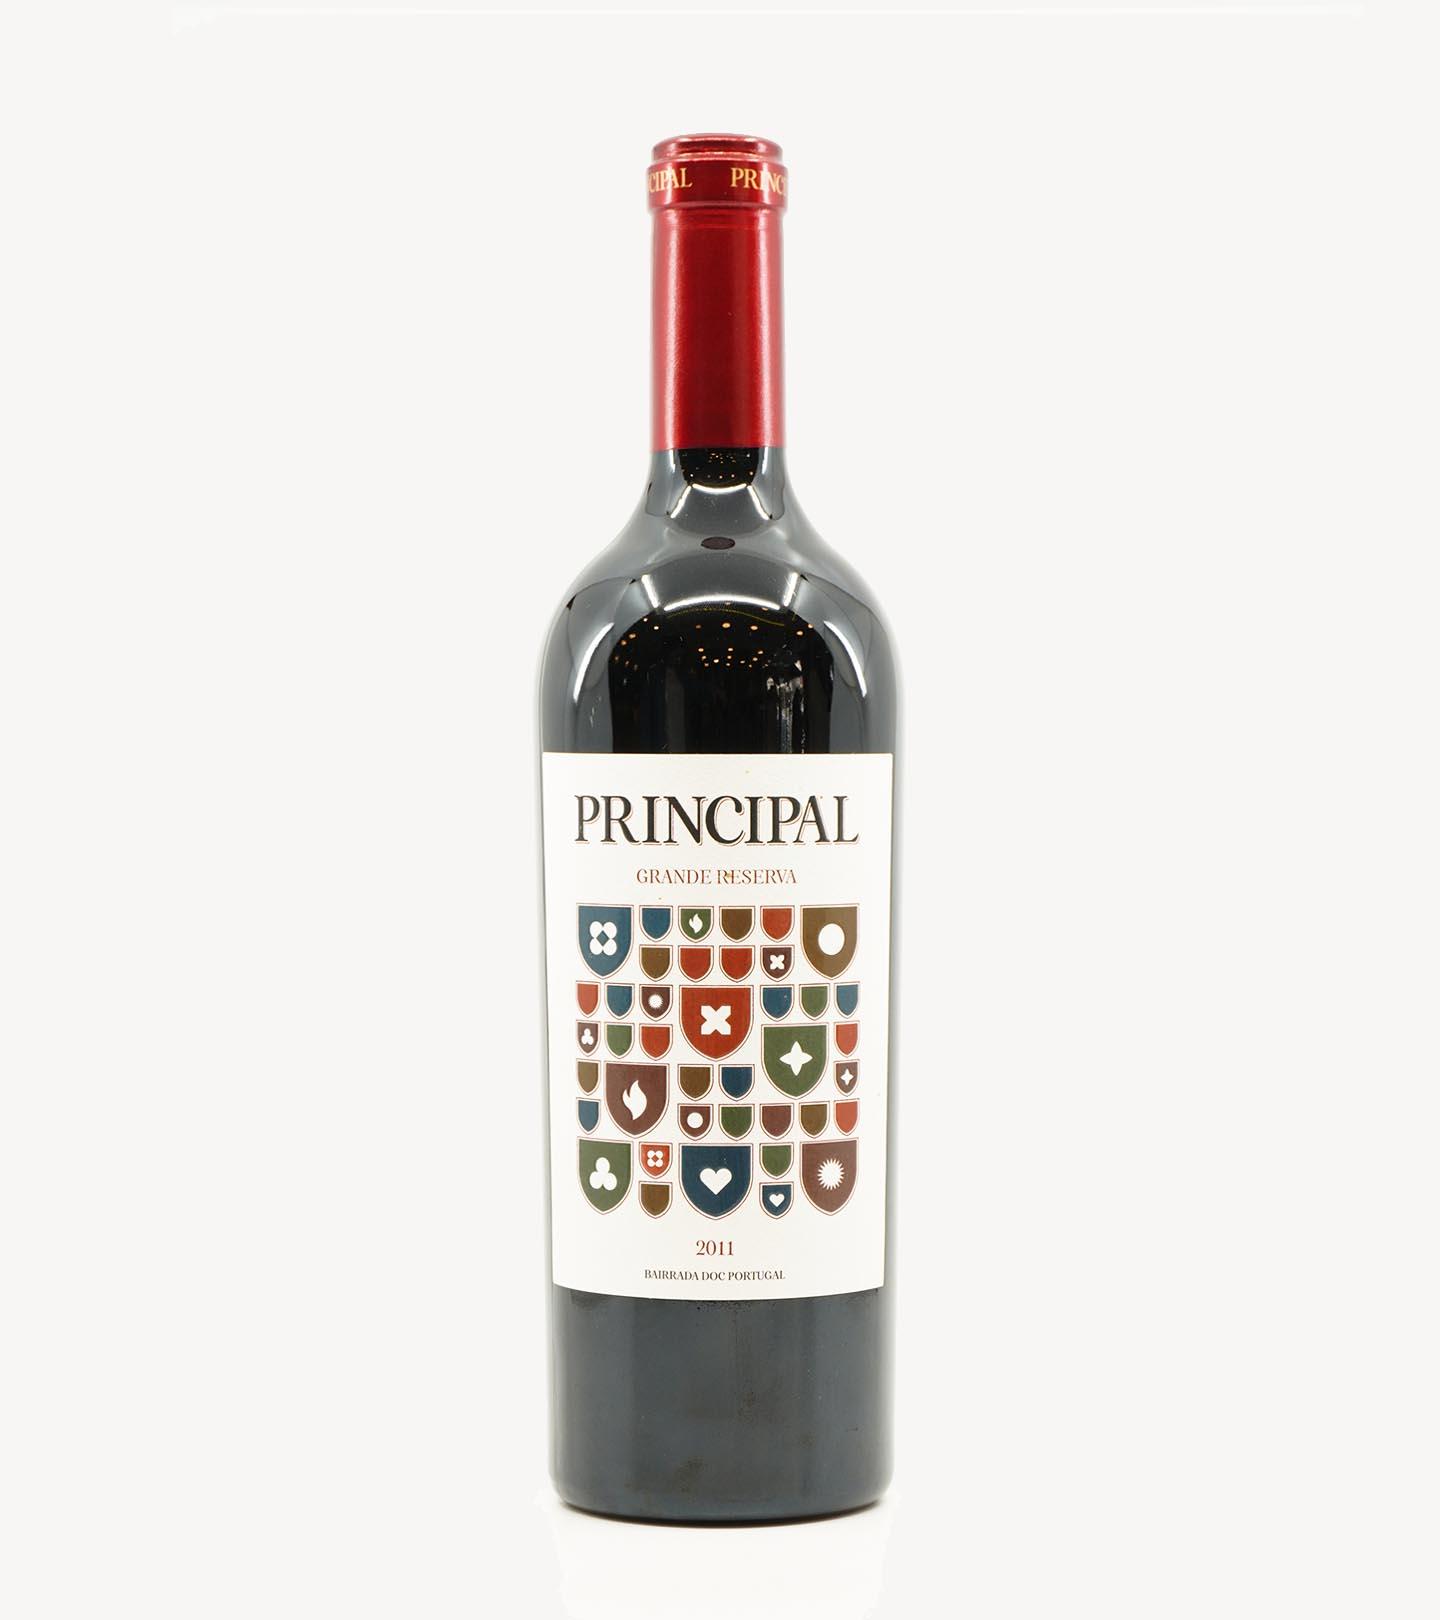 Vinho Tinto Bairrada Principal Grande Reserva 75cl